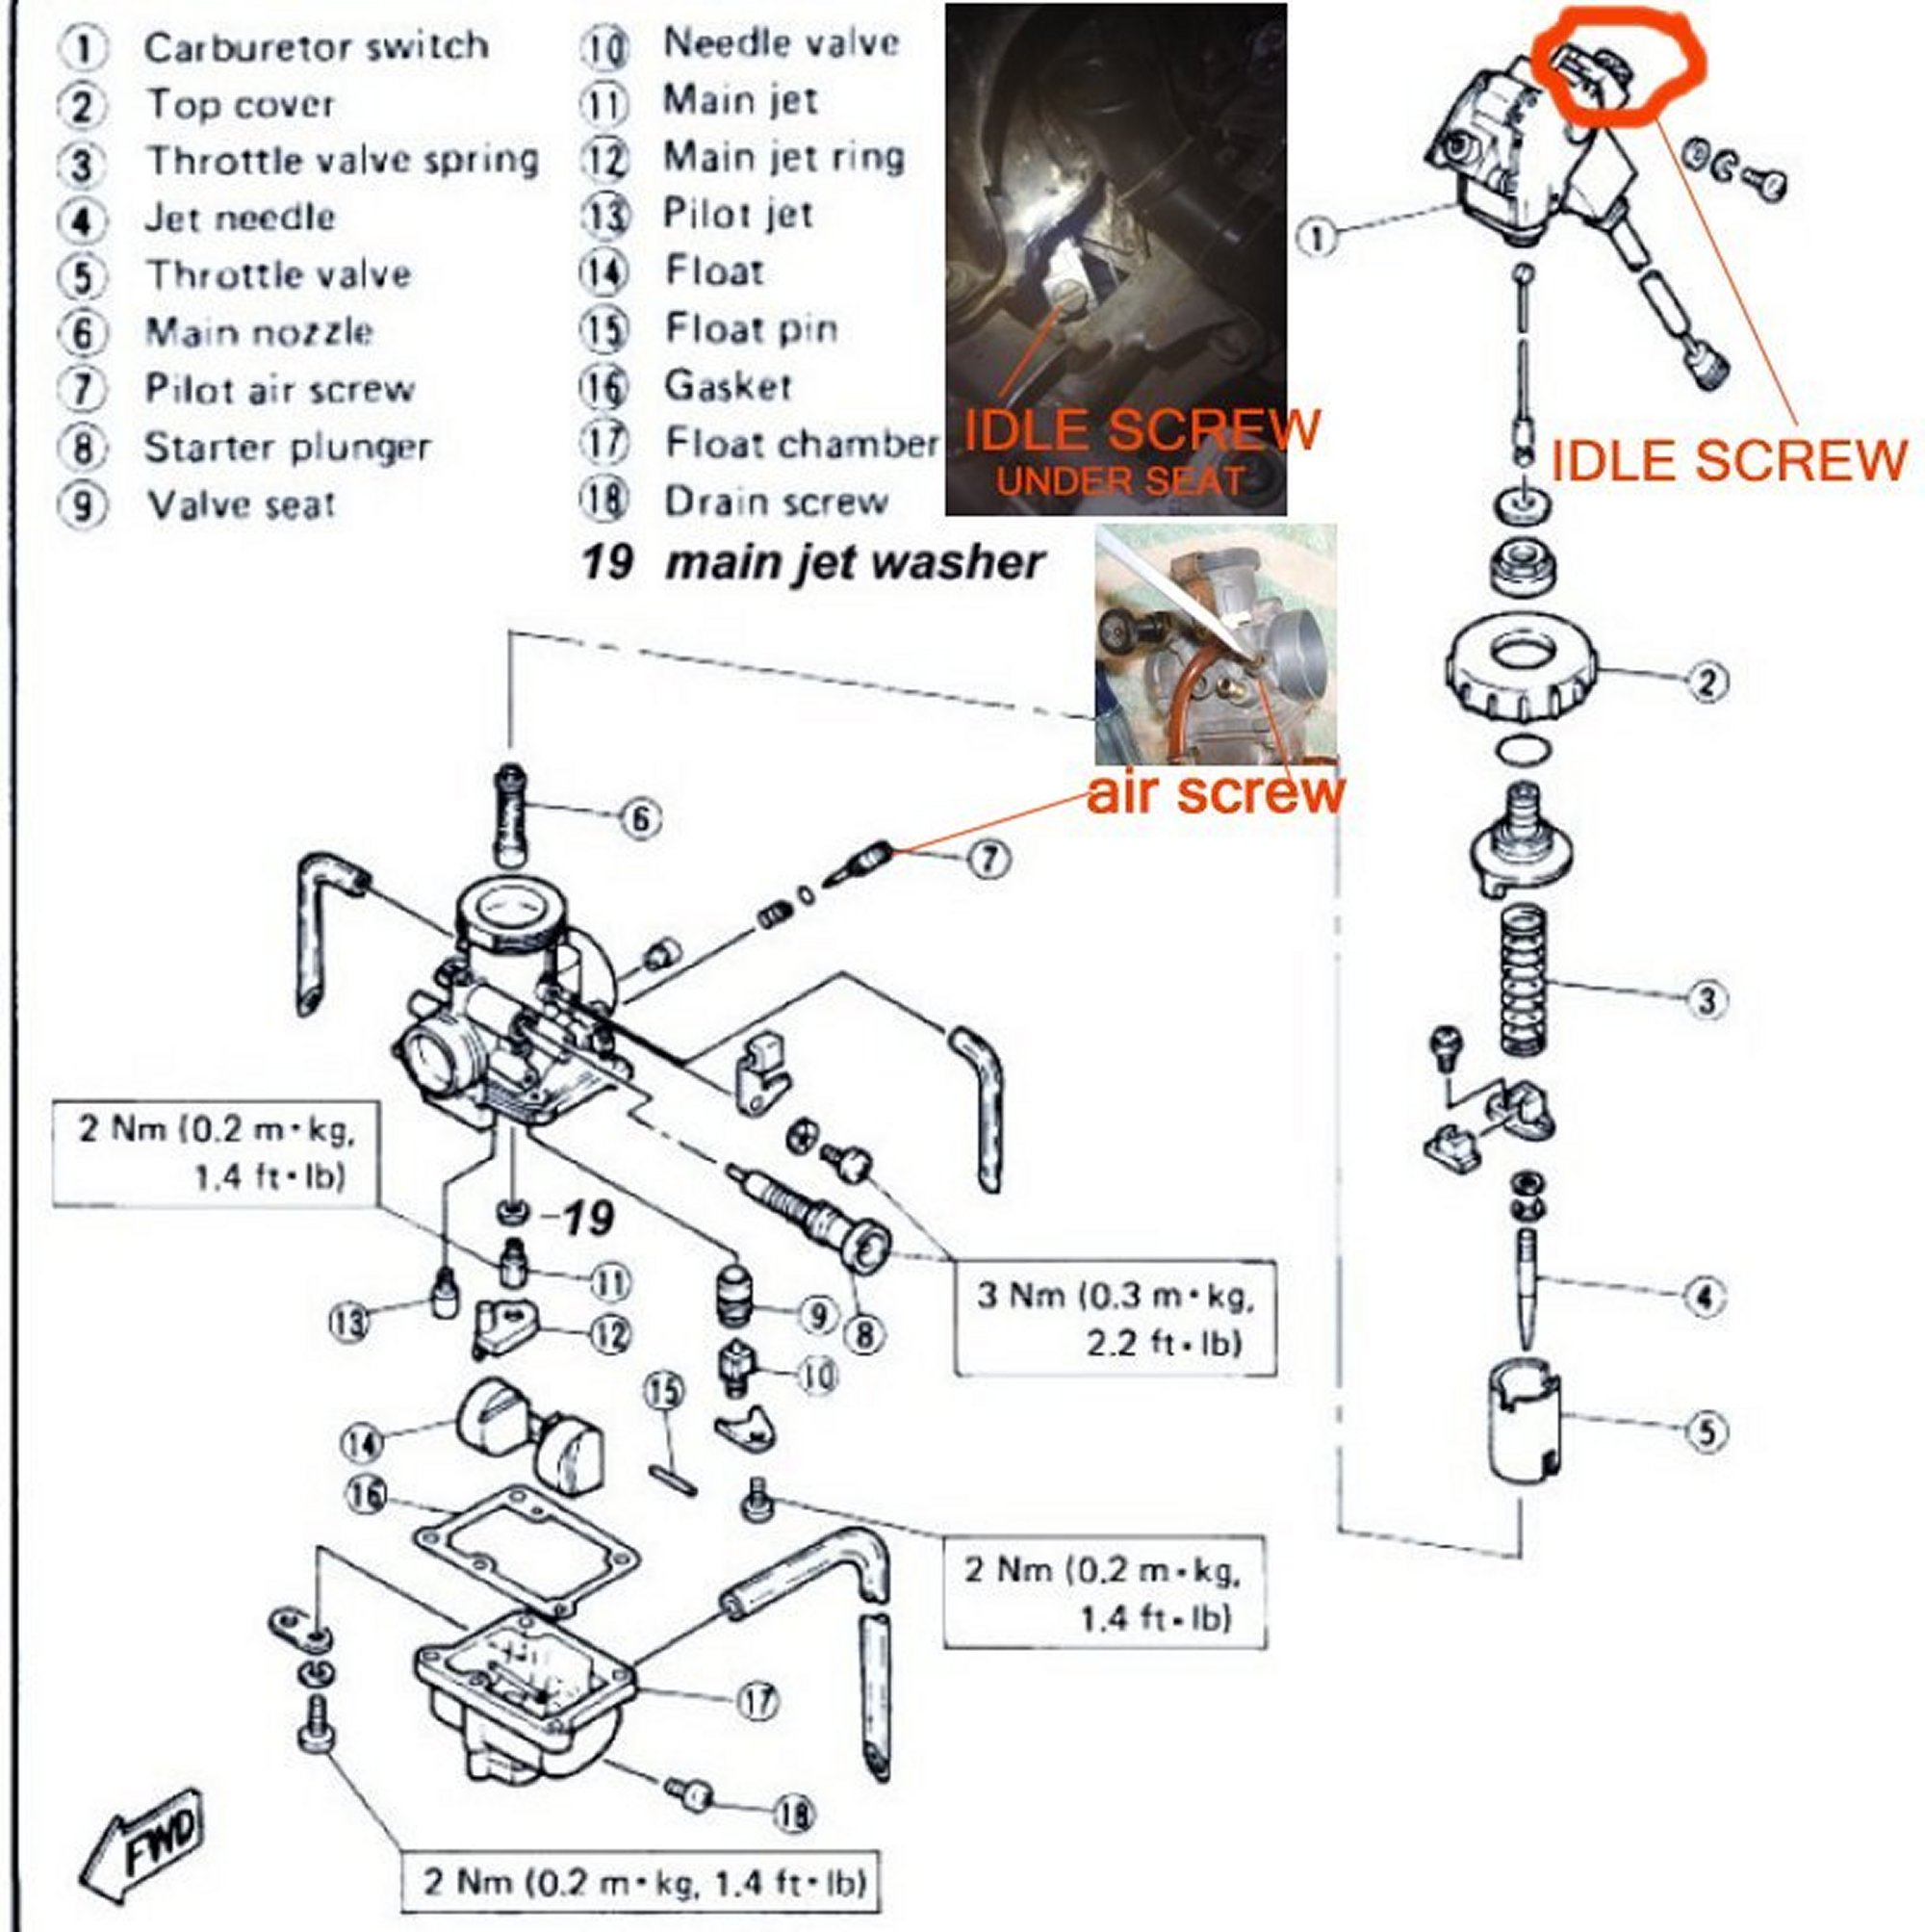 Yamaha Blaster Carburetor Diagram List Of Schematic Circuit Wiring 2001 Honda Xr80 Disconnect Tors On 2005 Blasterforum Com Rh 2004